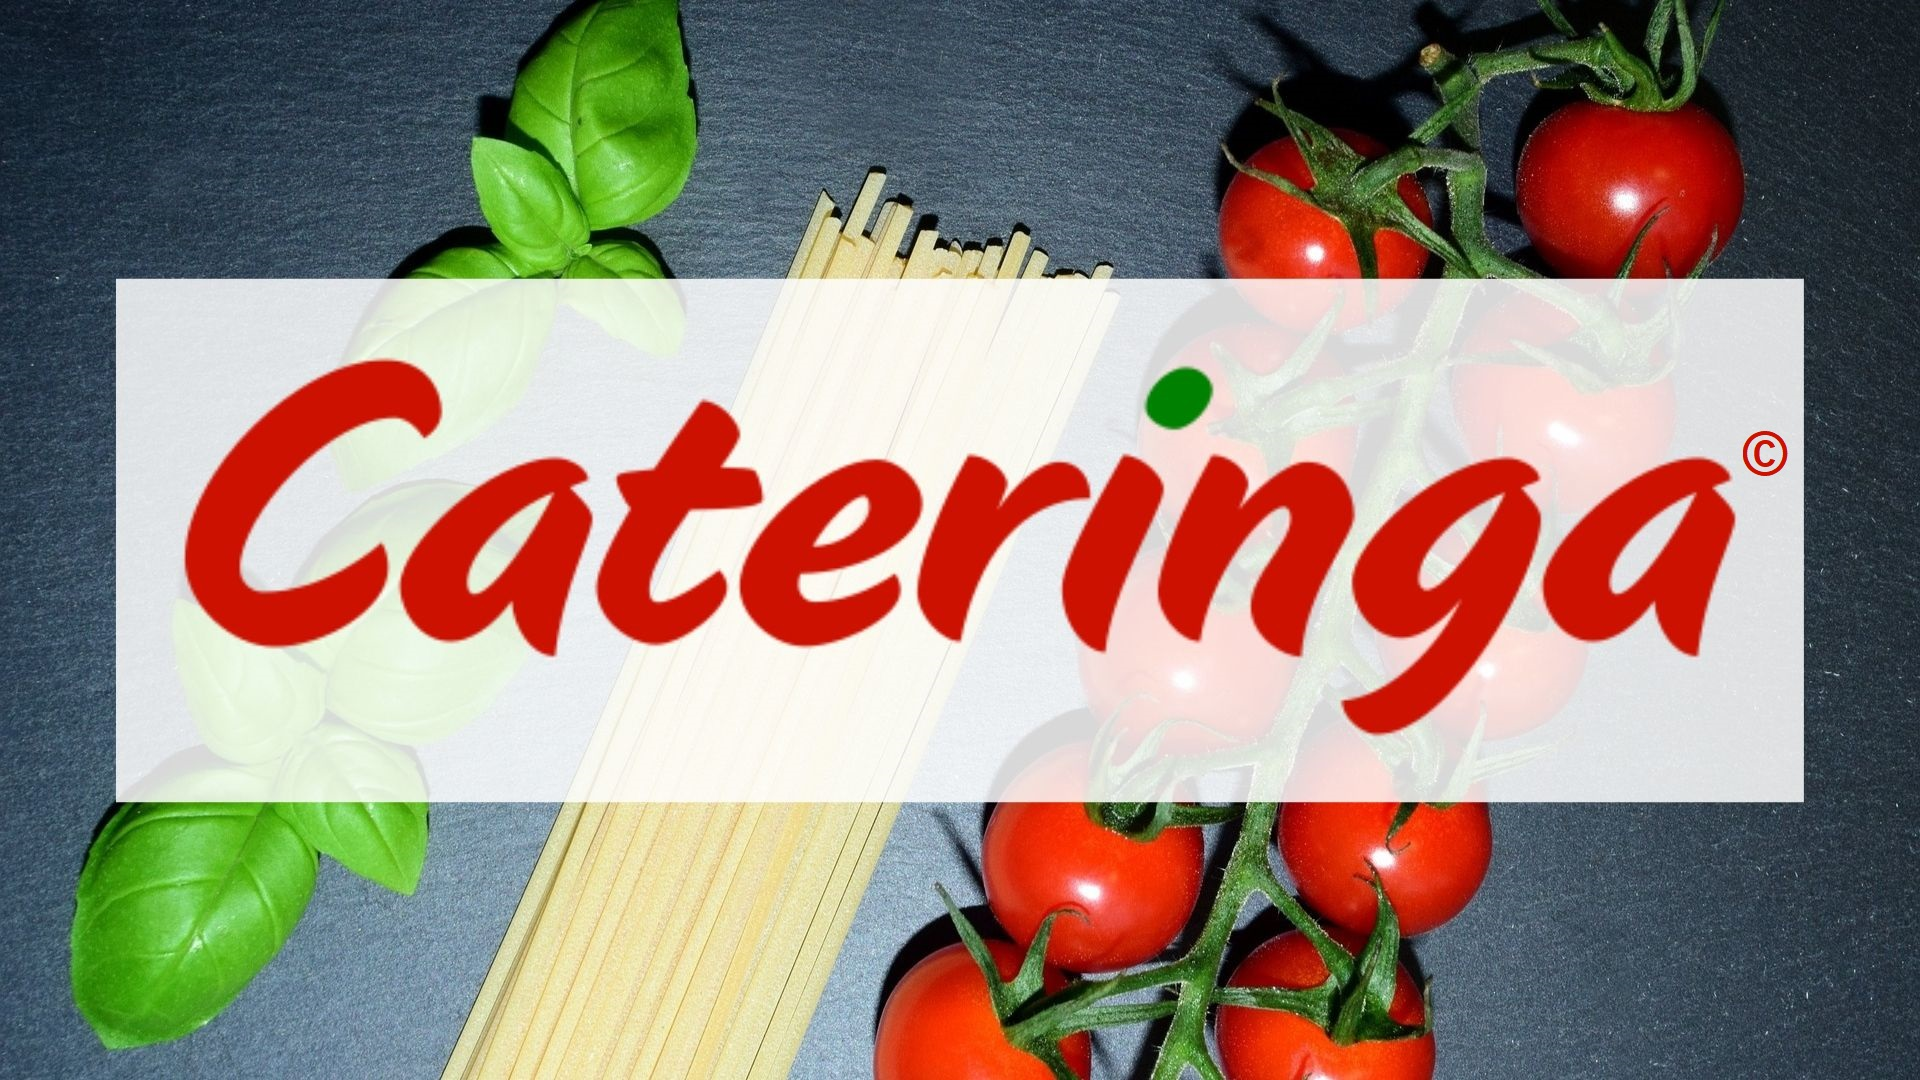 Cateringa